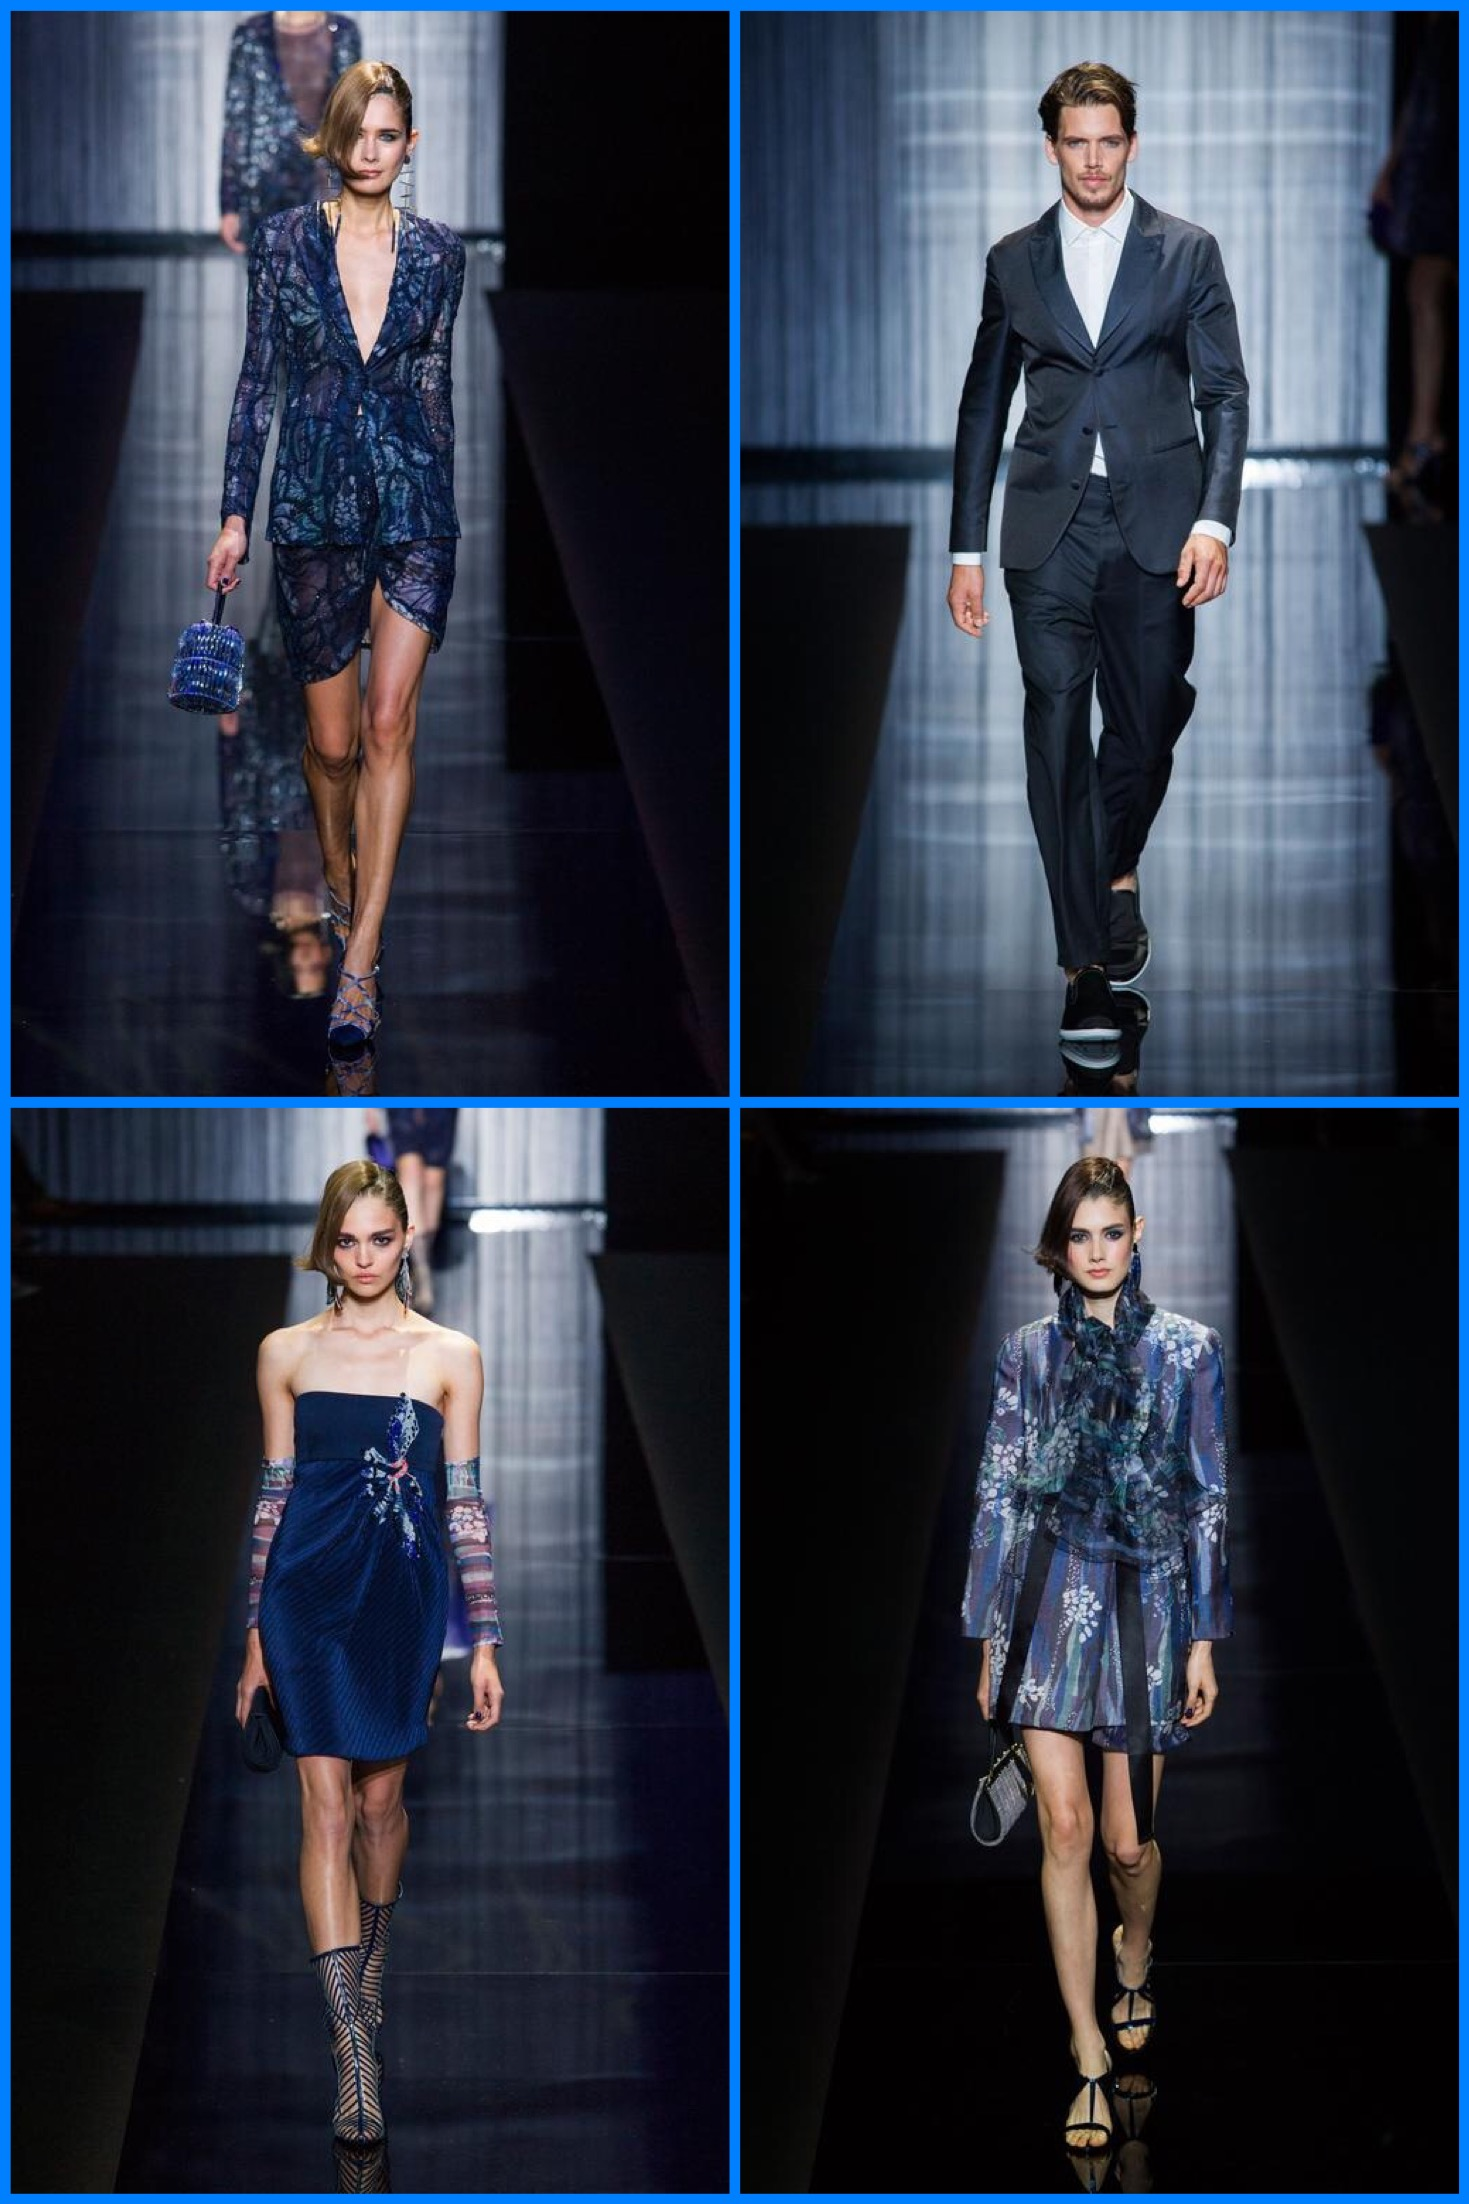 milano-fashion-week-pret-a-porter-spring-summer-2017-style-giorgio-armani